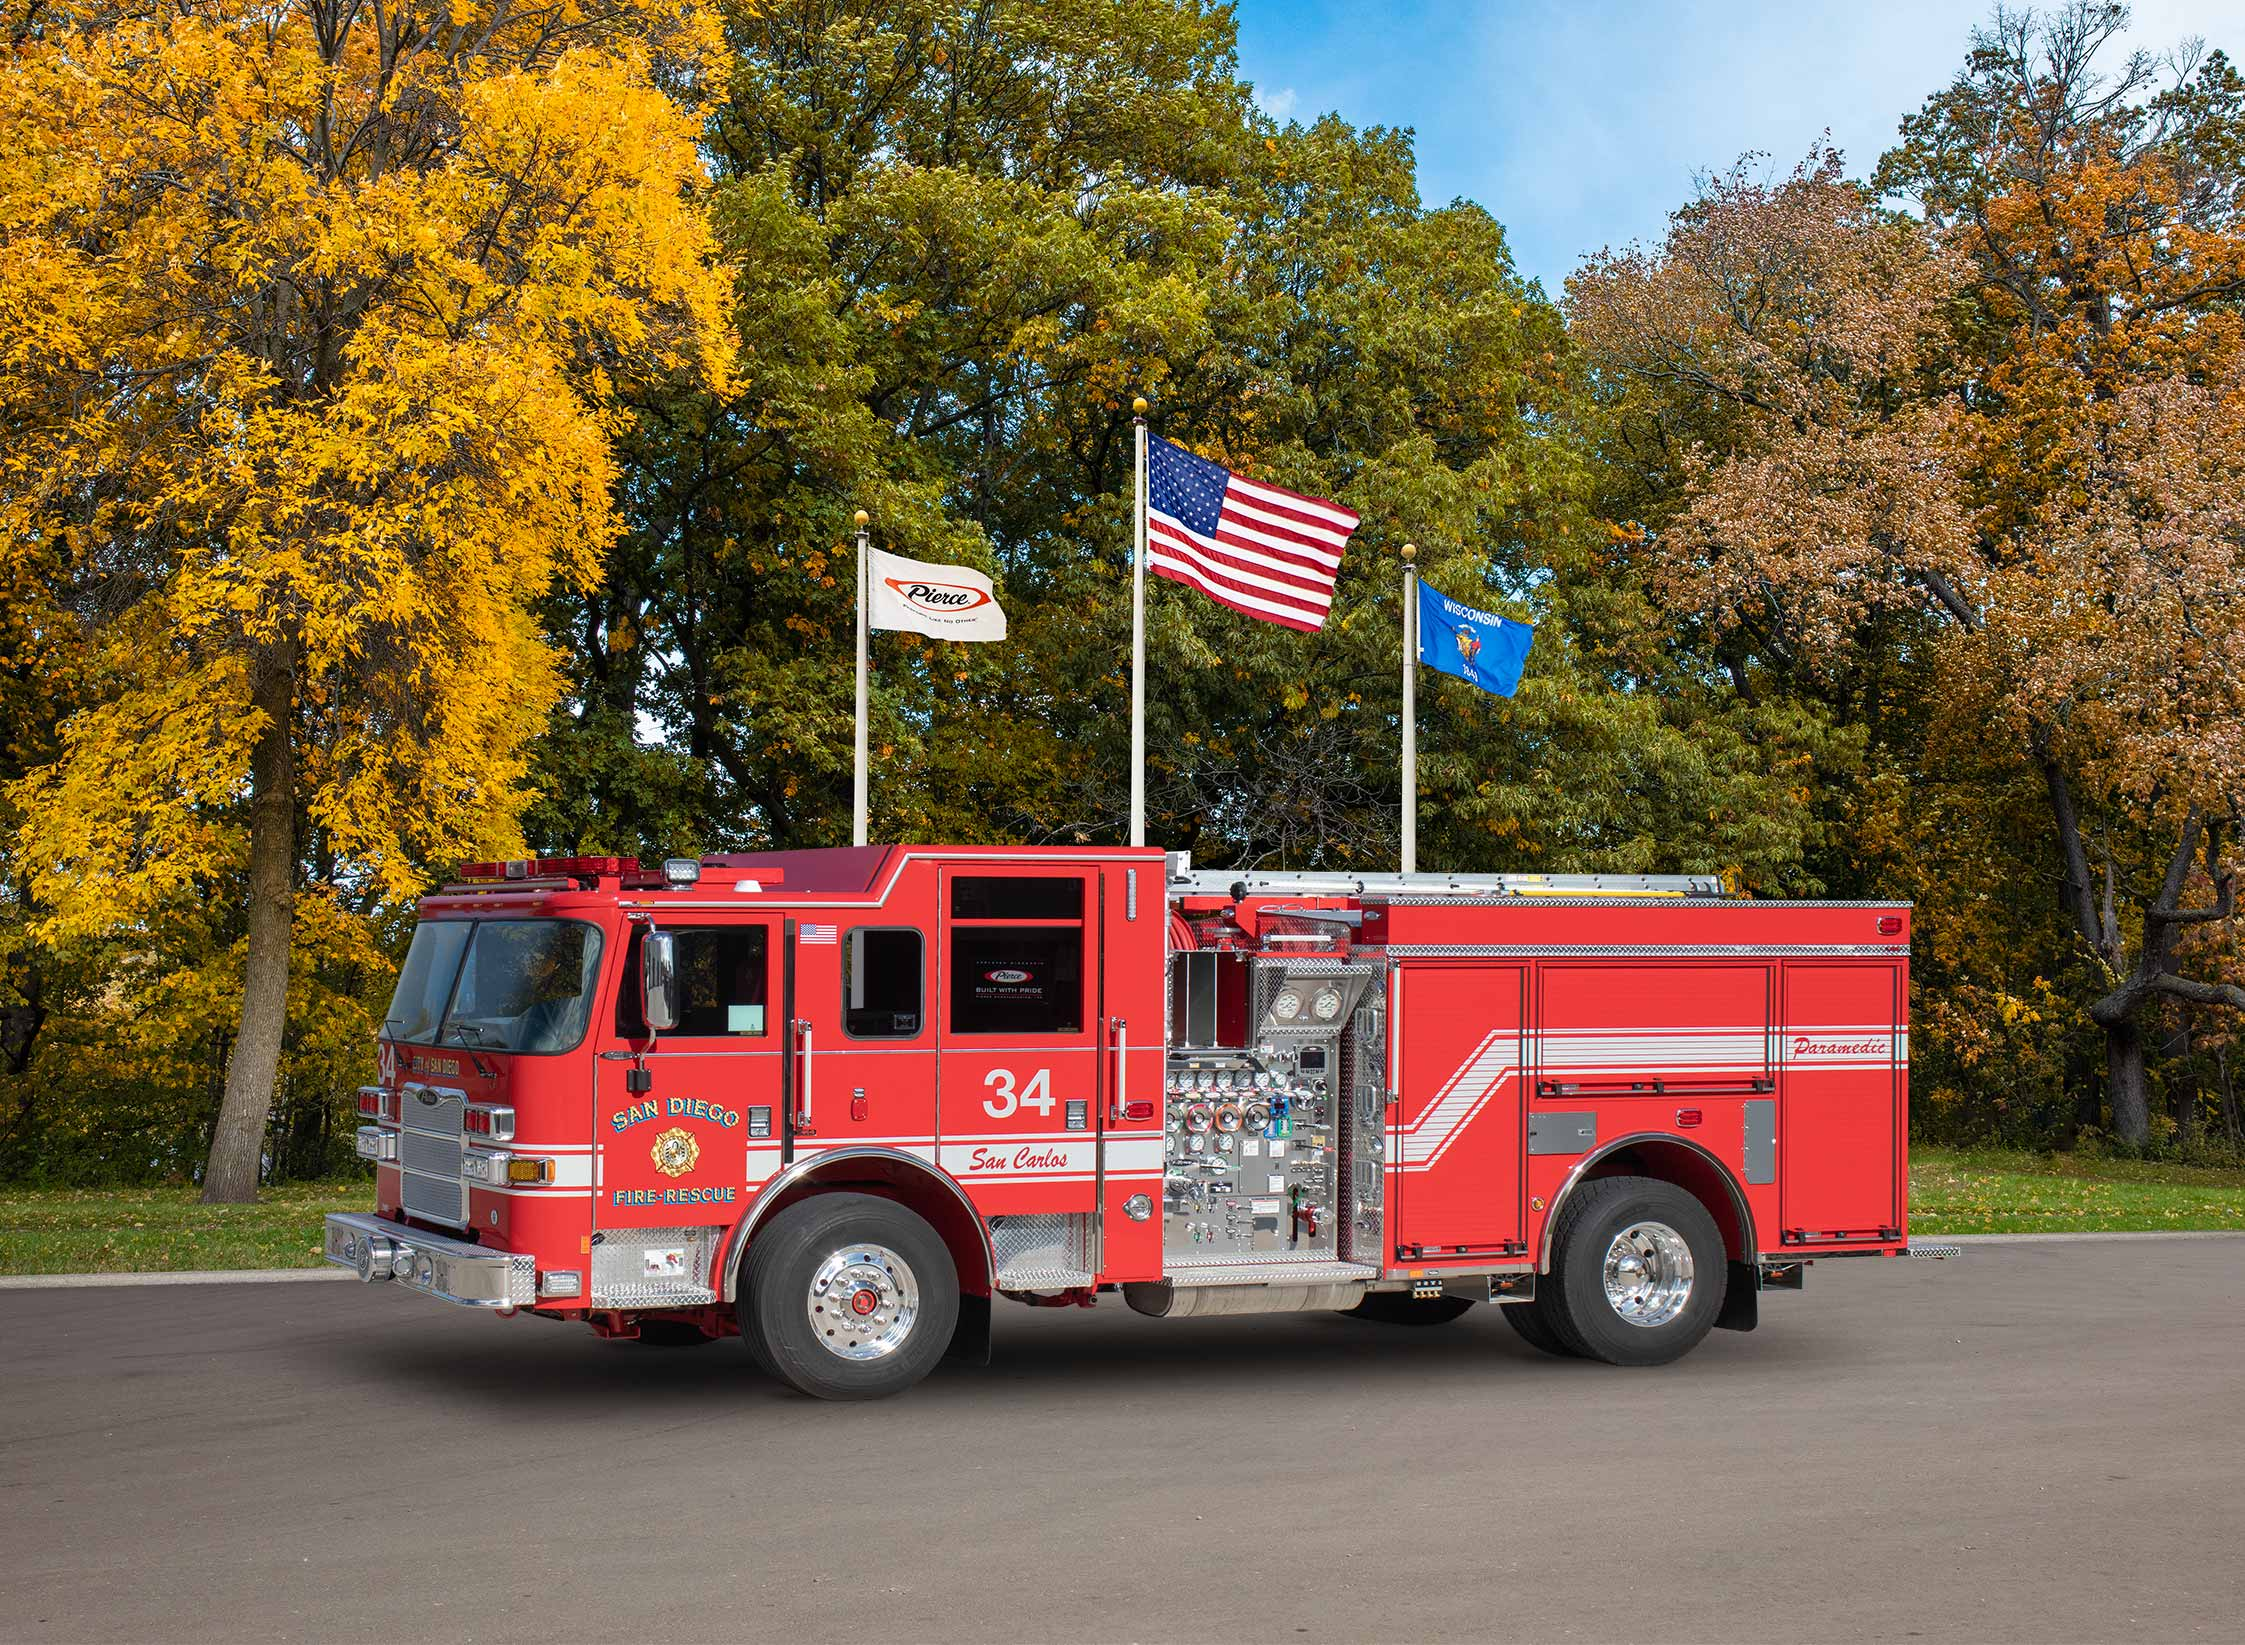 San Diego Fire Department - Pumper